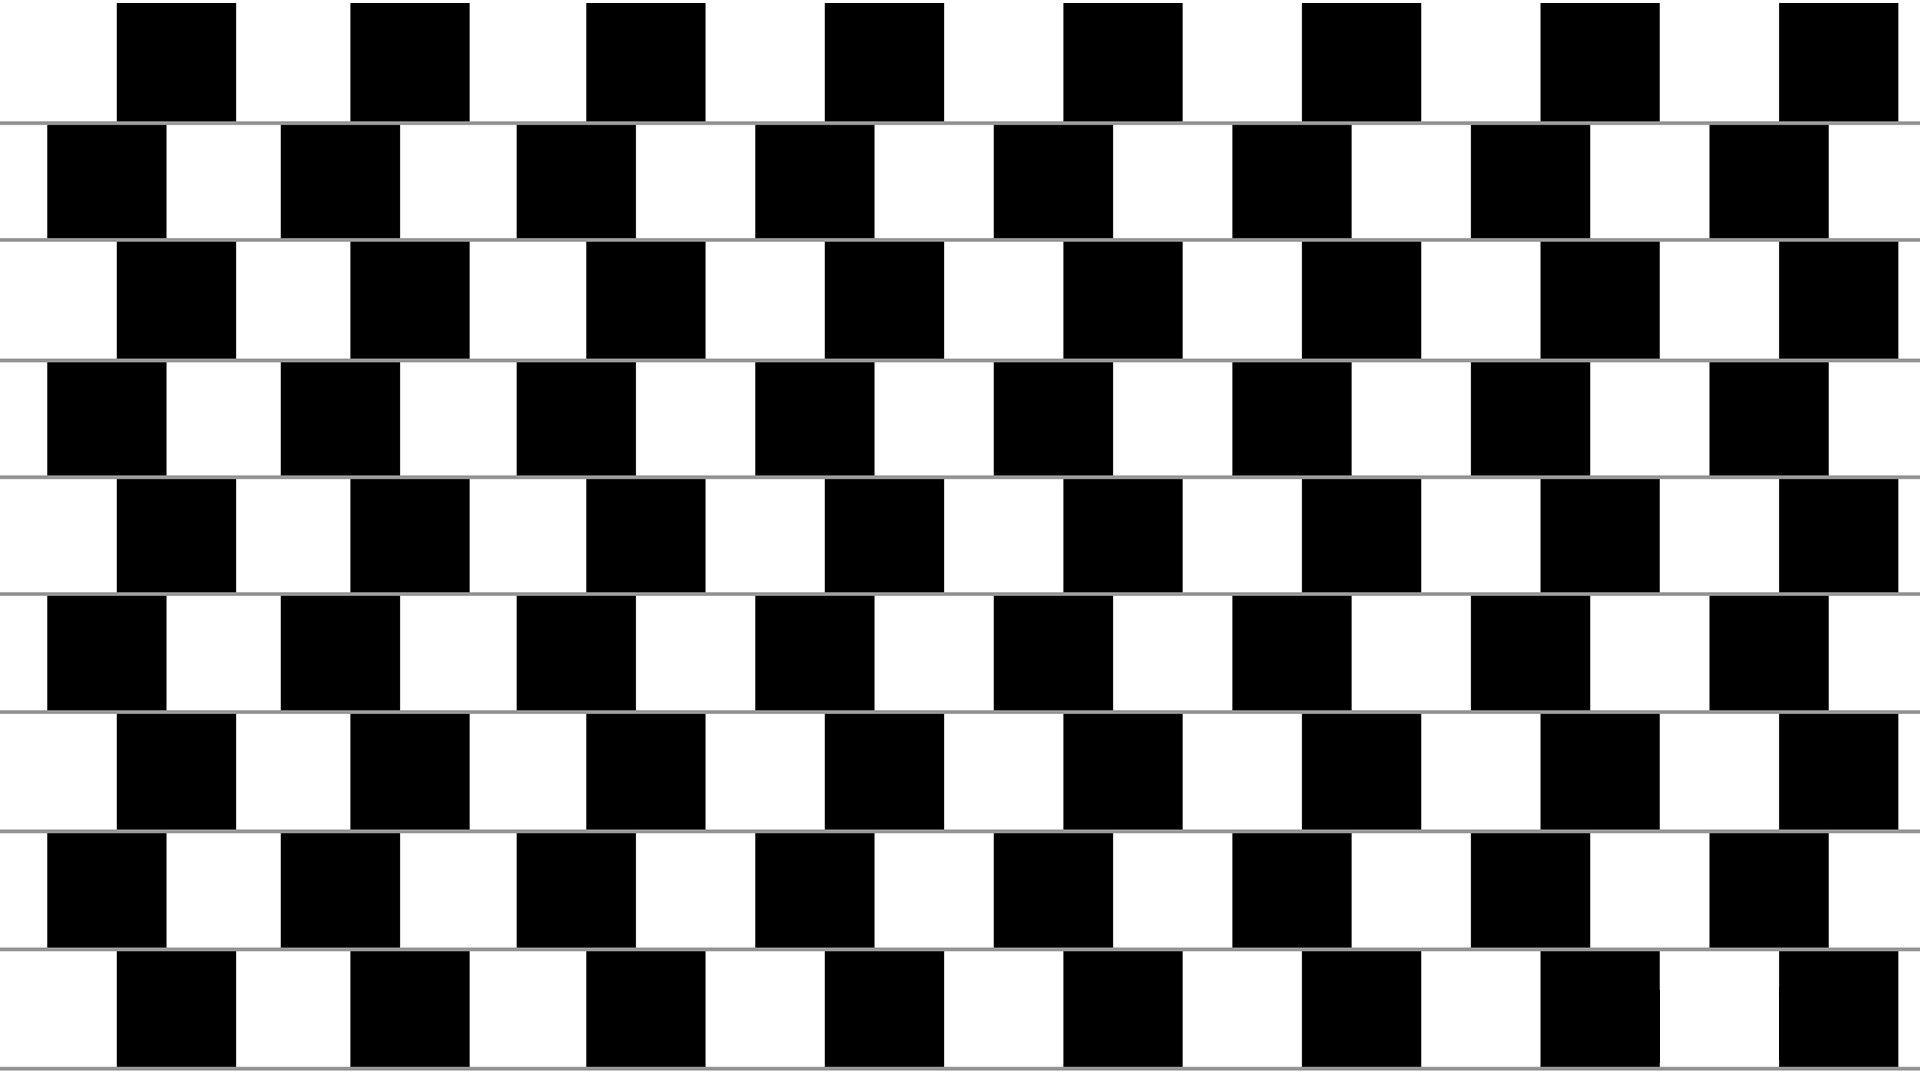 Optical Illusion Art Google Search Optical Illusion Wallpaper Optical Illusions Illusions 3d effect optical illusion wallpaper